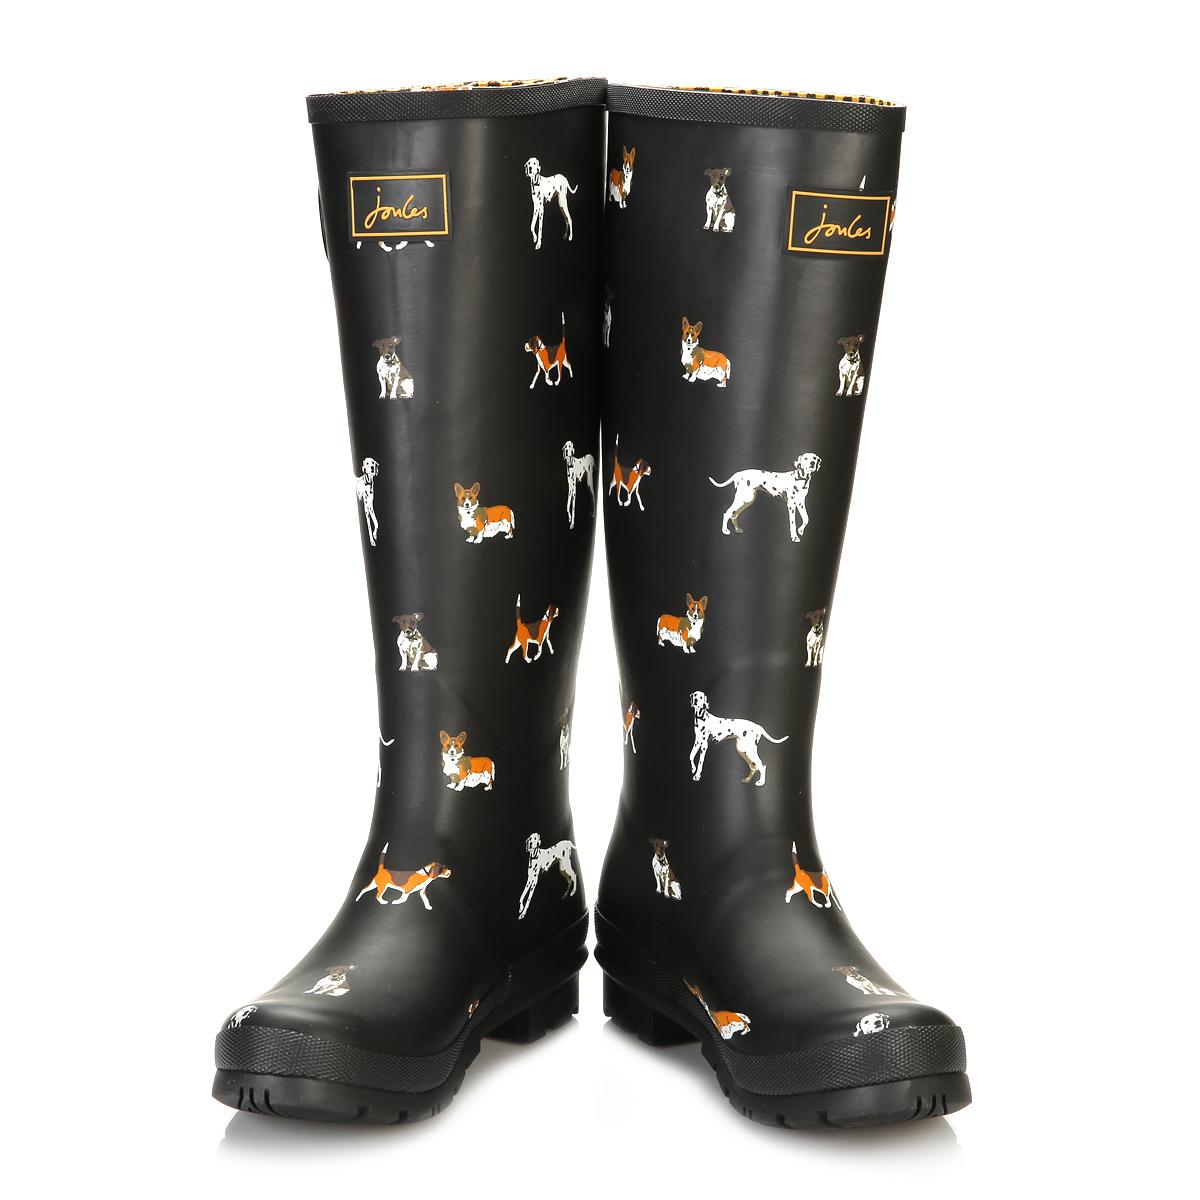 joules womens mid calf black wellington boots chip